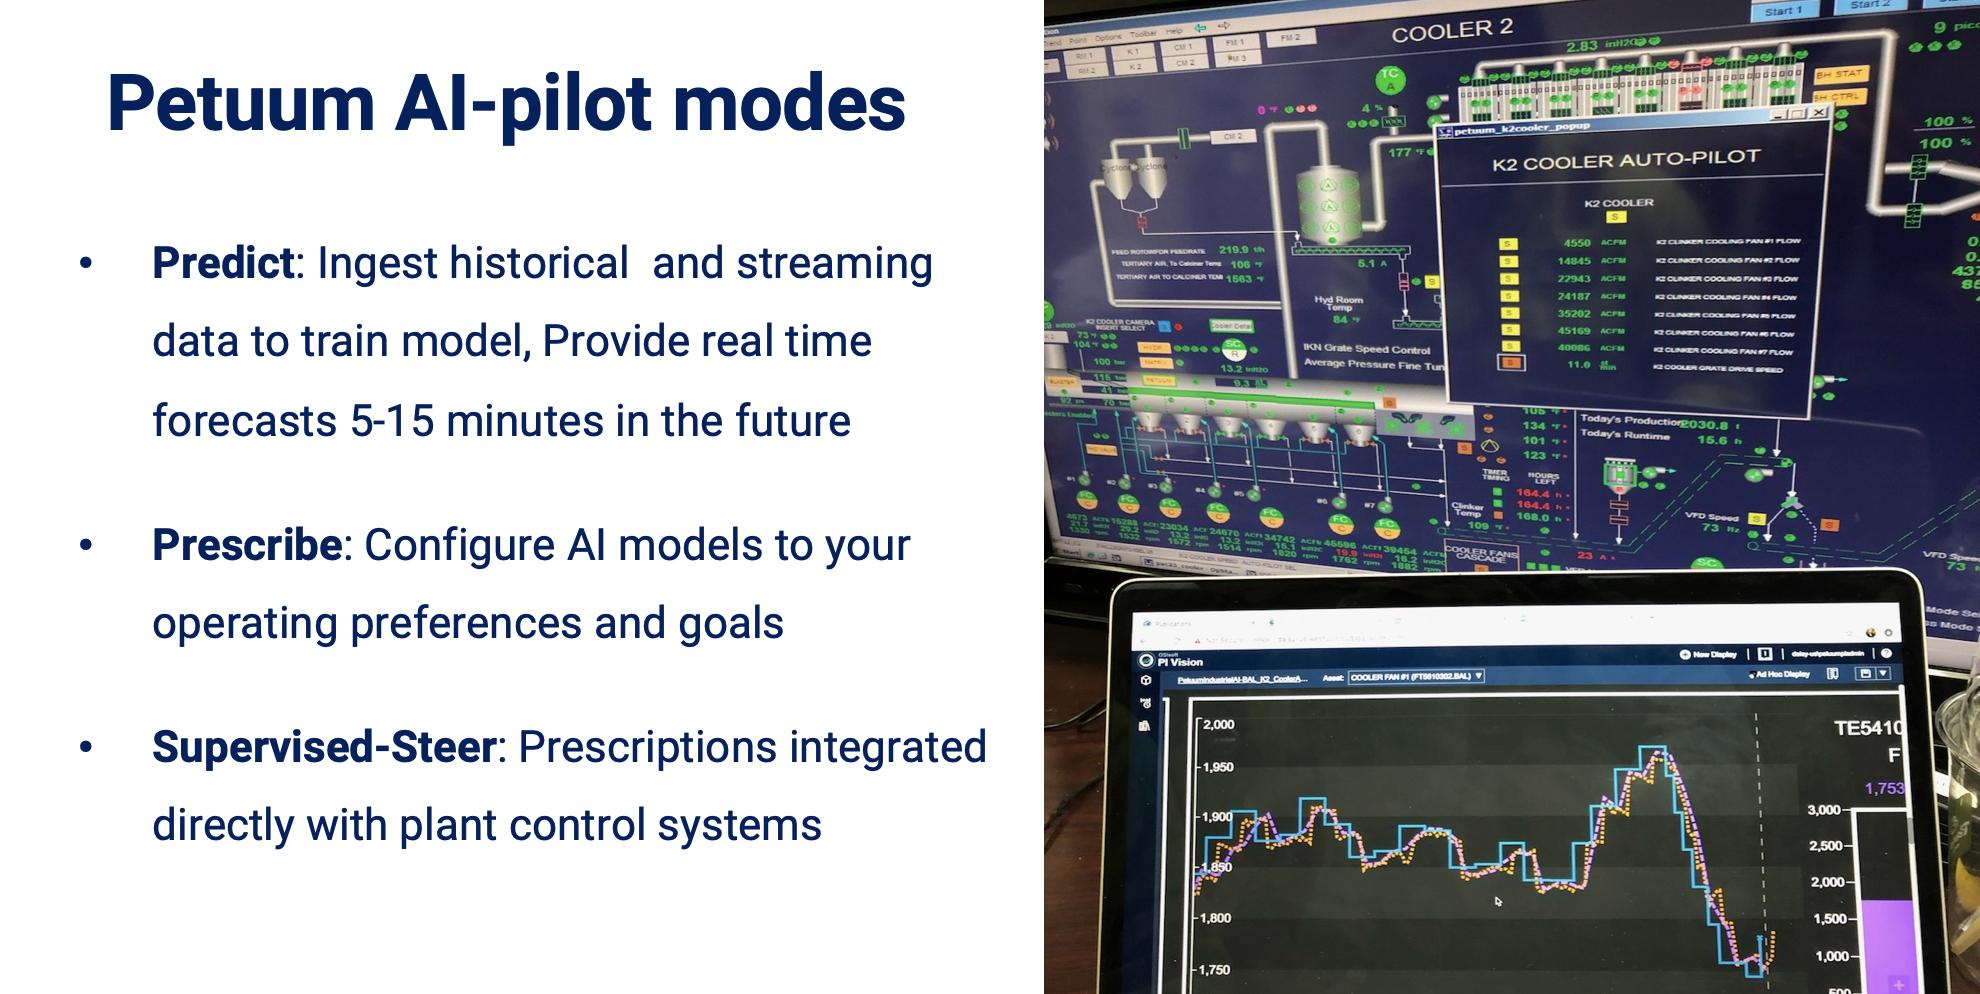 Petuum AI-pilot modes of operation